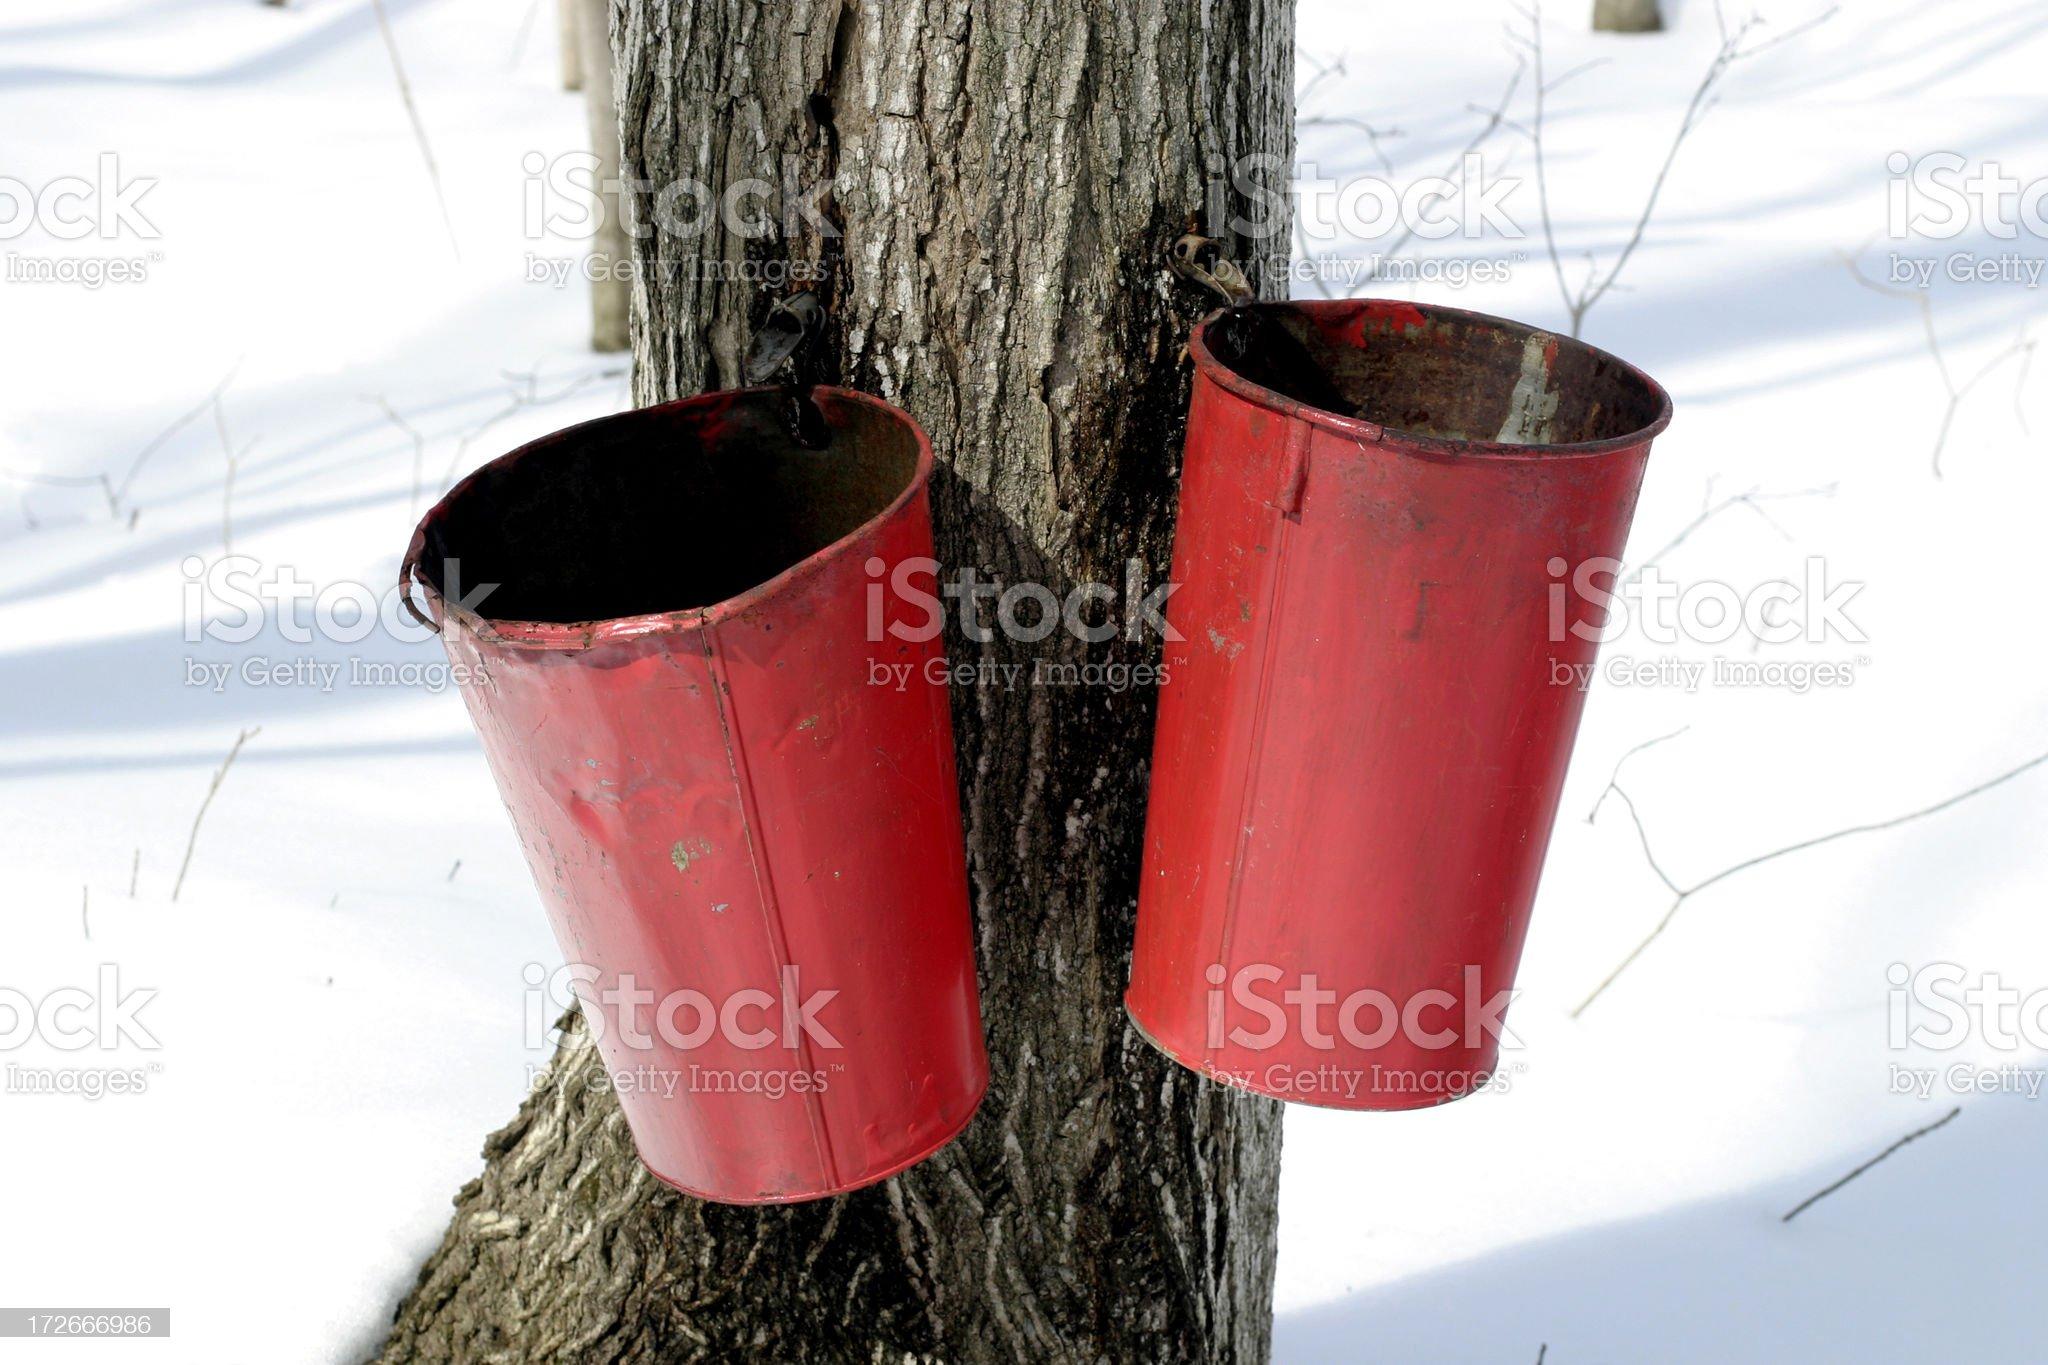 Maple sap time royalty-free stock photo